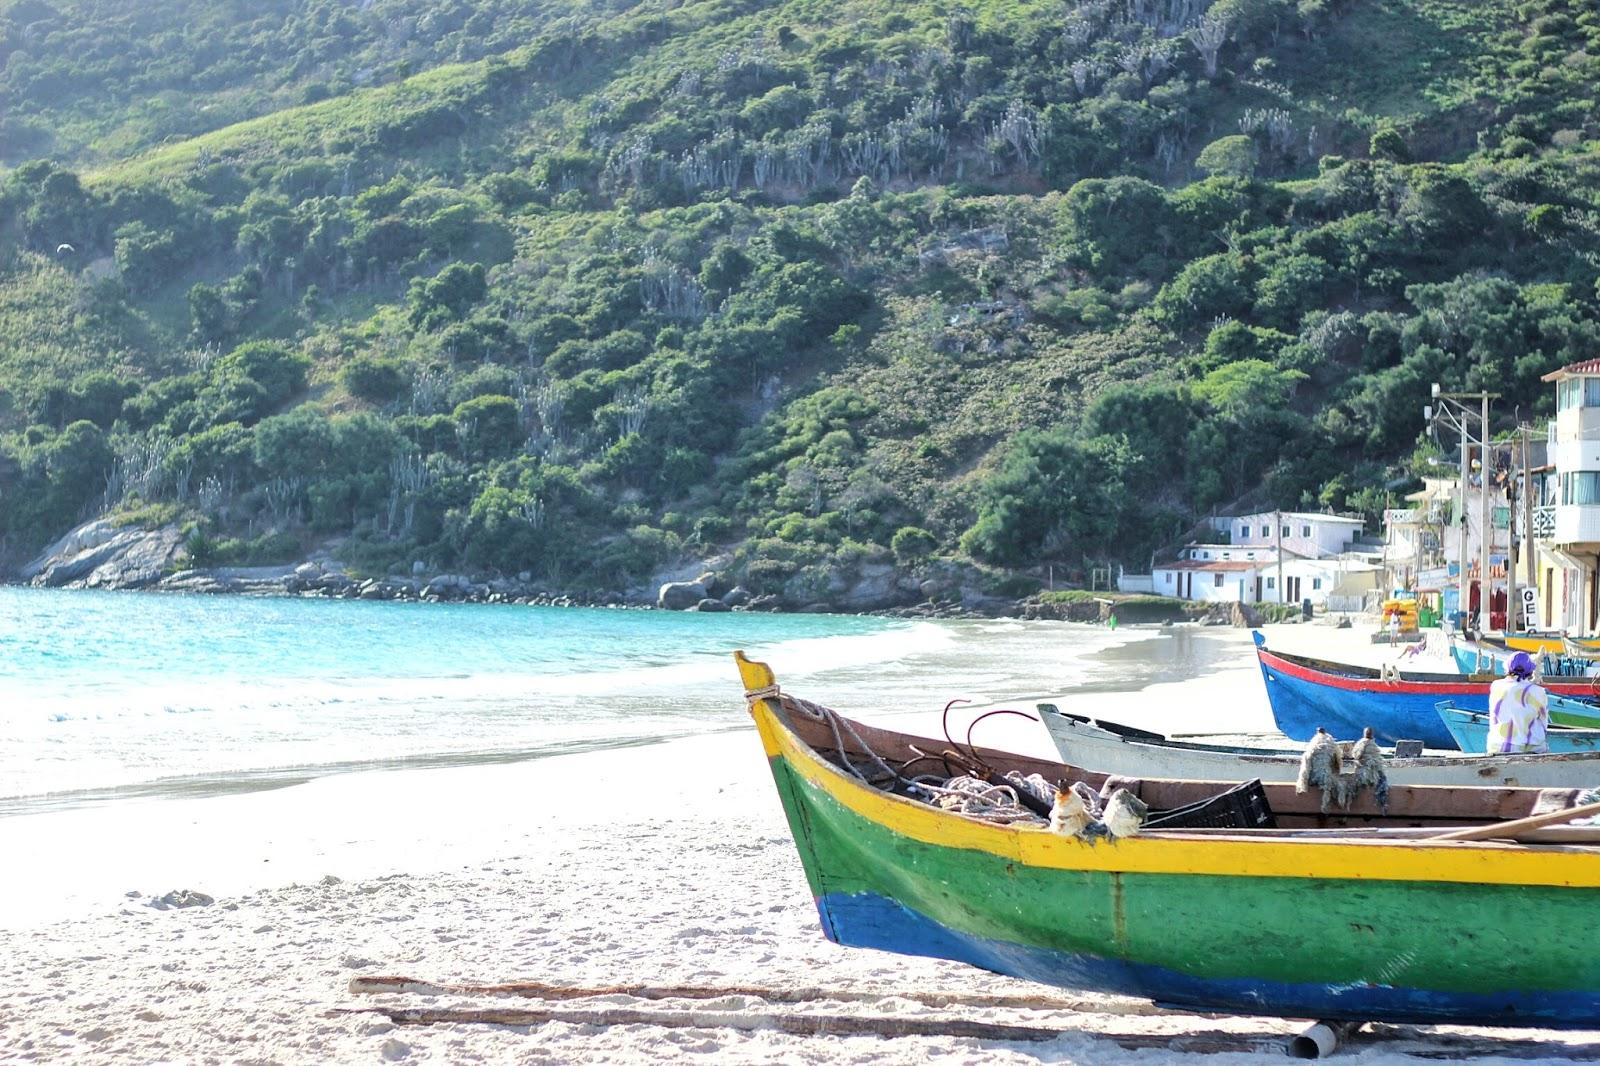 lifesthayle-arraial-do-cabo-prainha-barcos.jpg